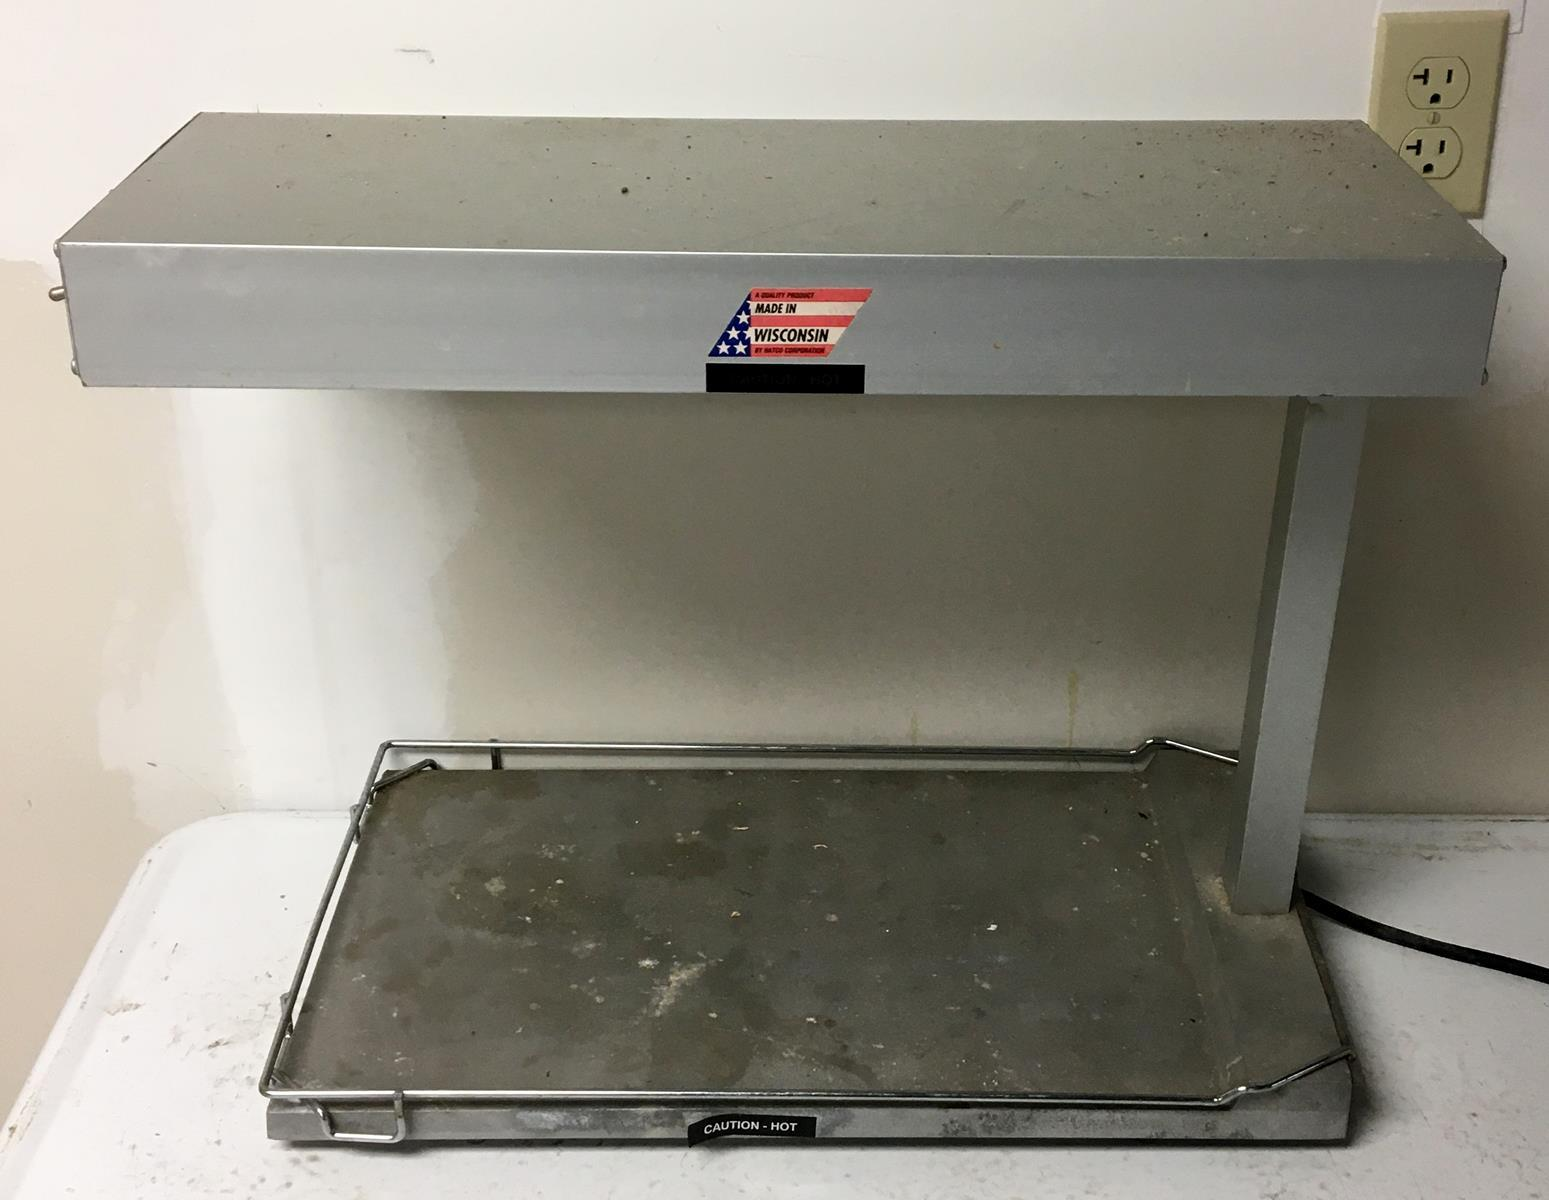 HATCO Glo-Ray Portable Food Warmer Heated Base with Light